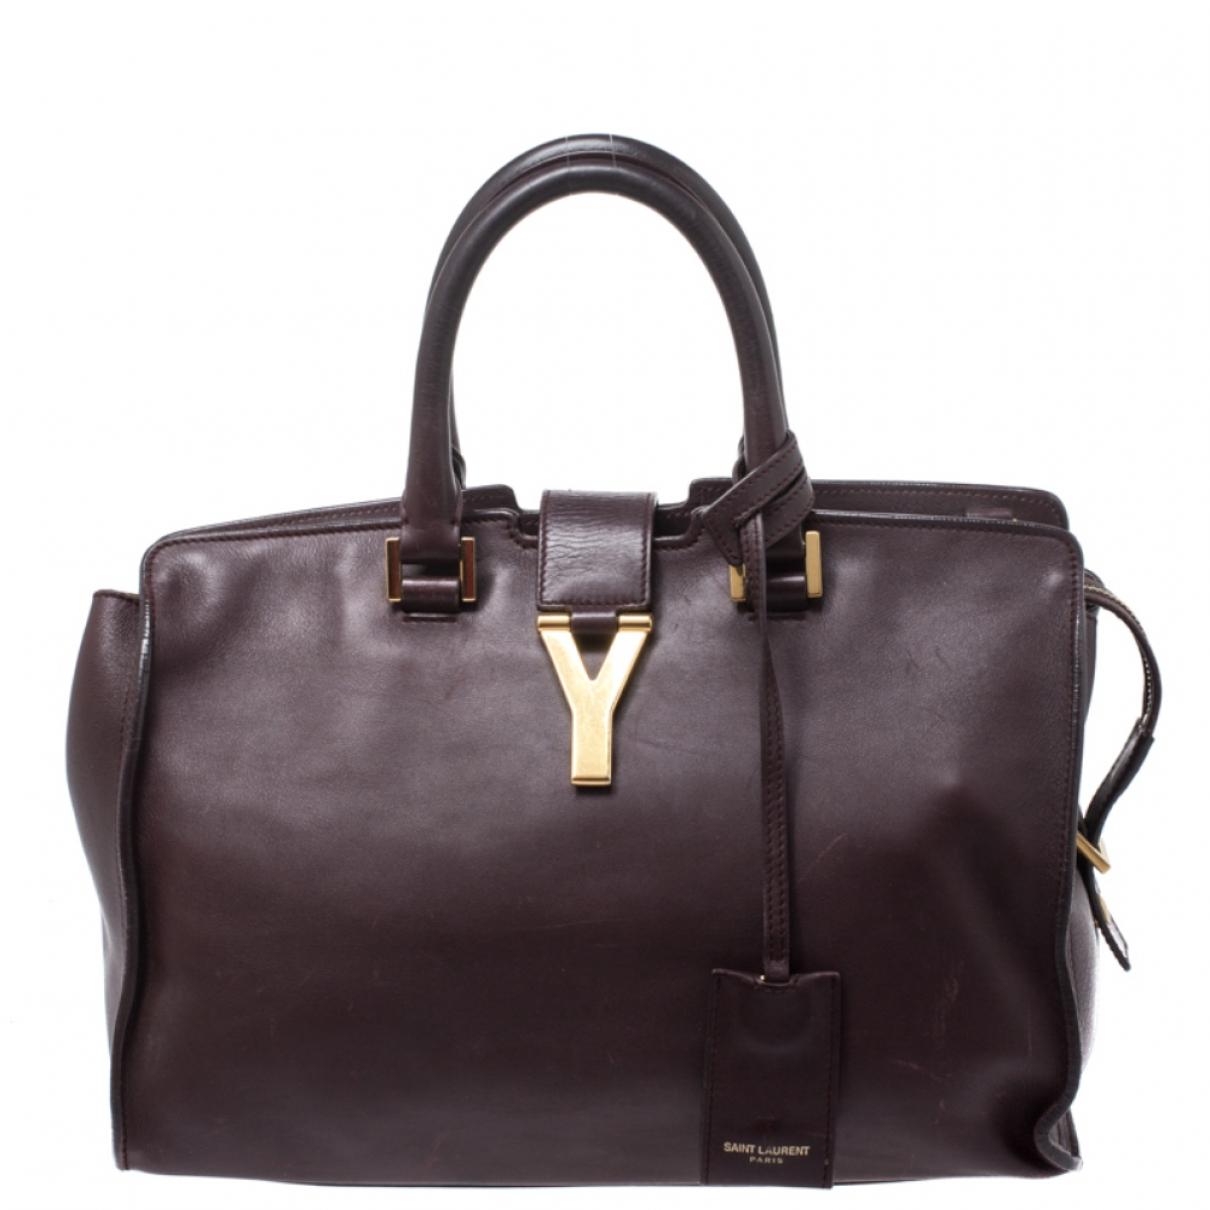 Saint Laurent Chyc Burgundy Leather handbag for Women \N